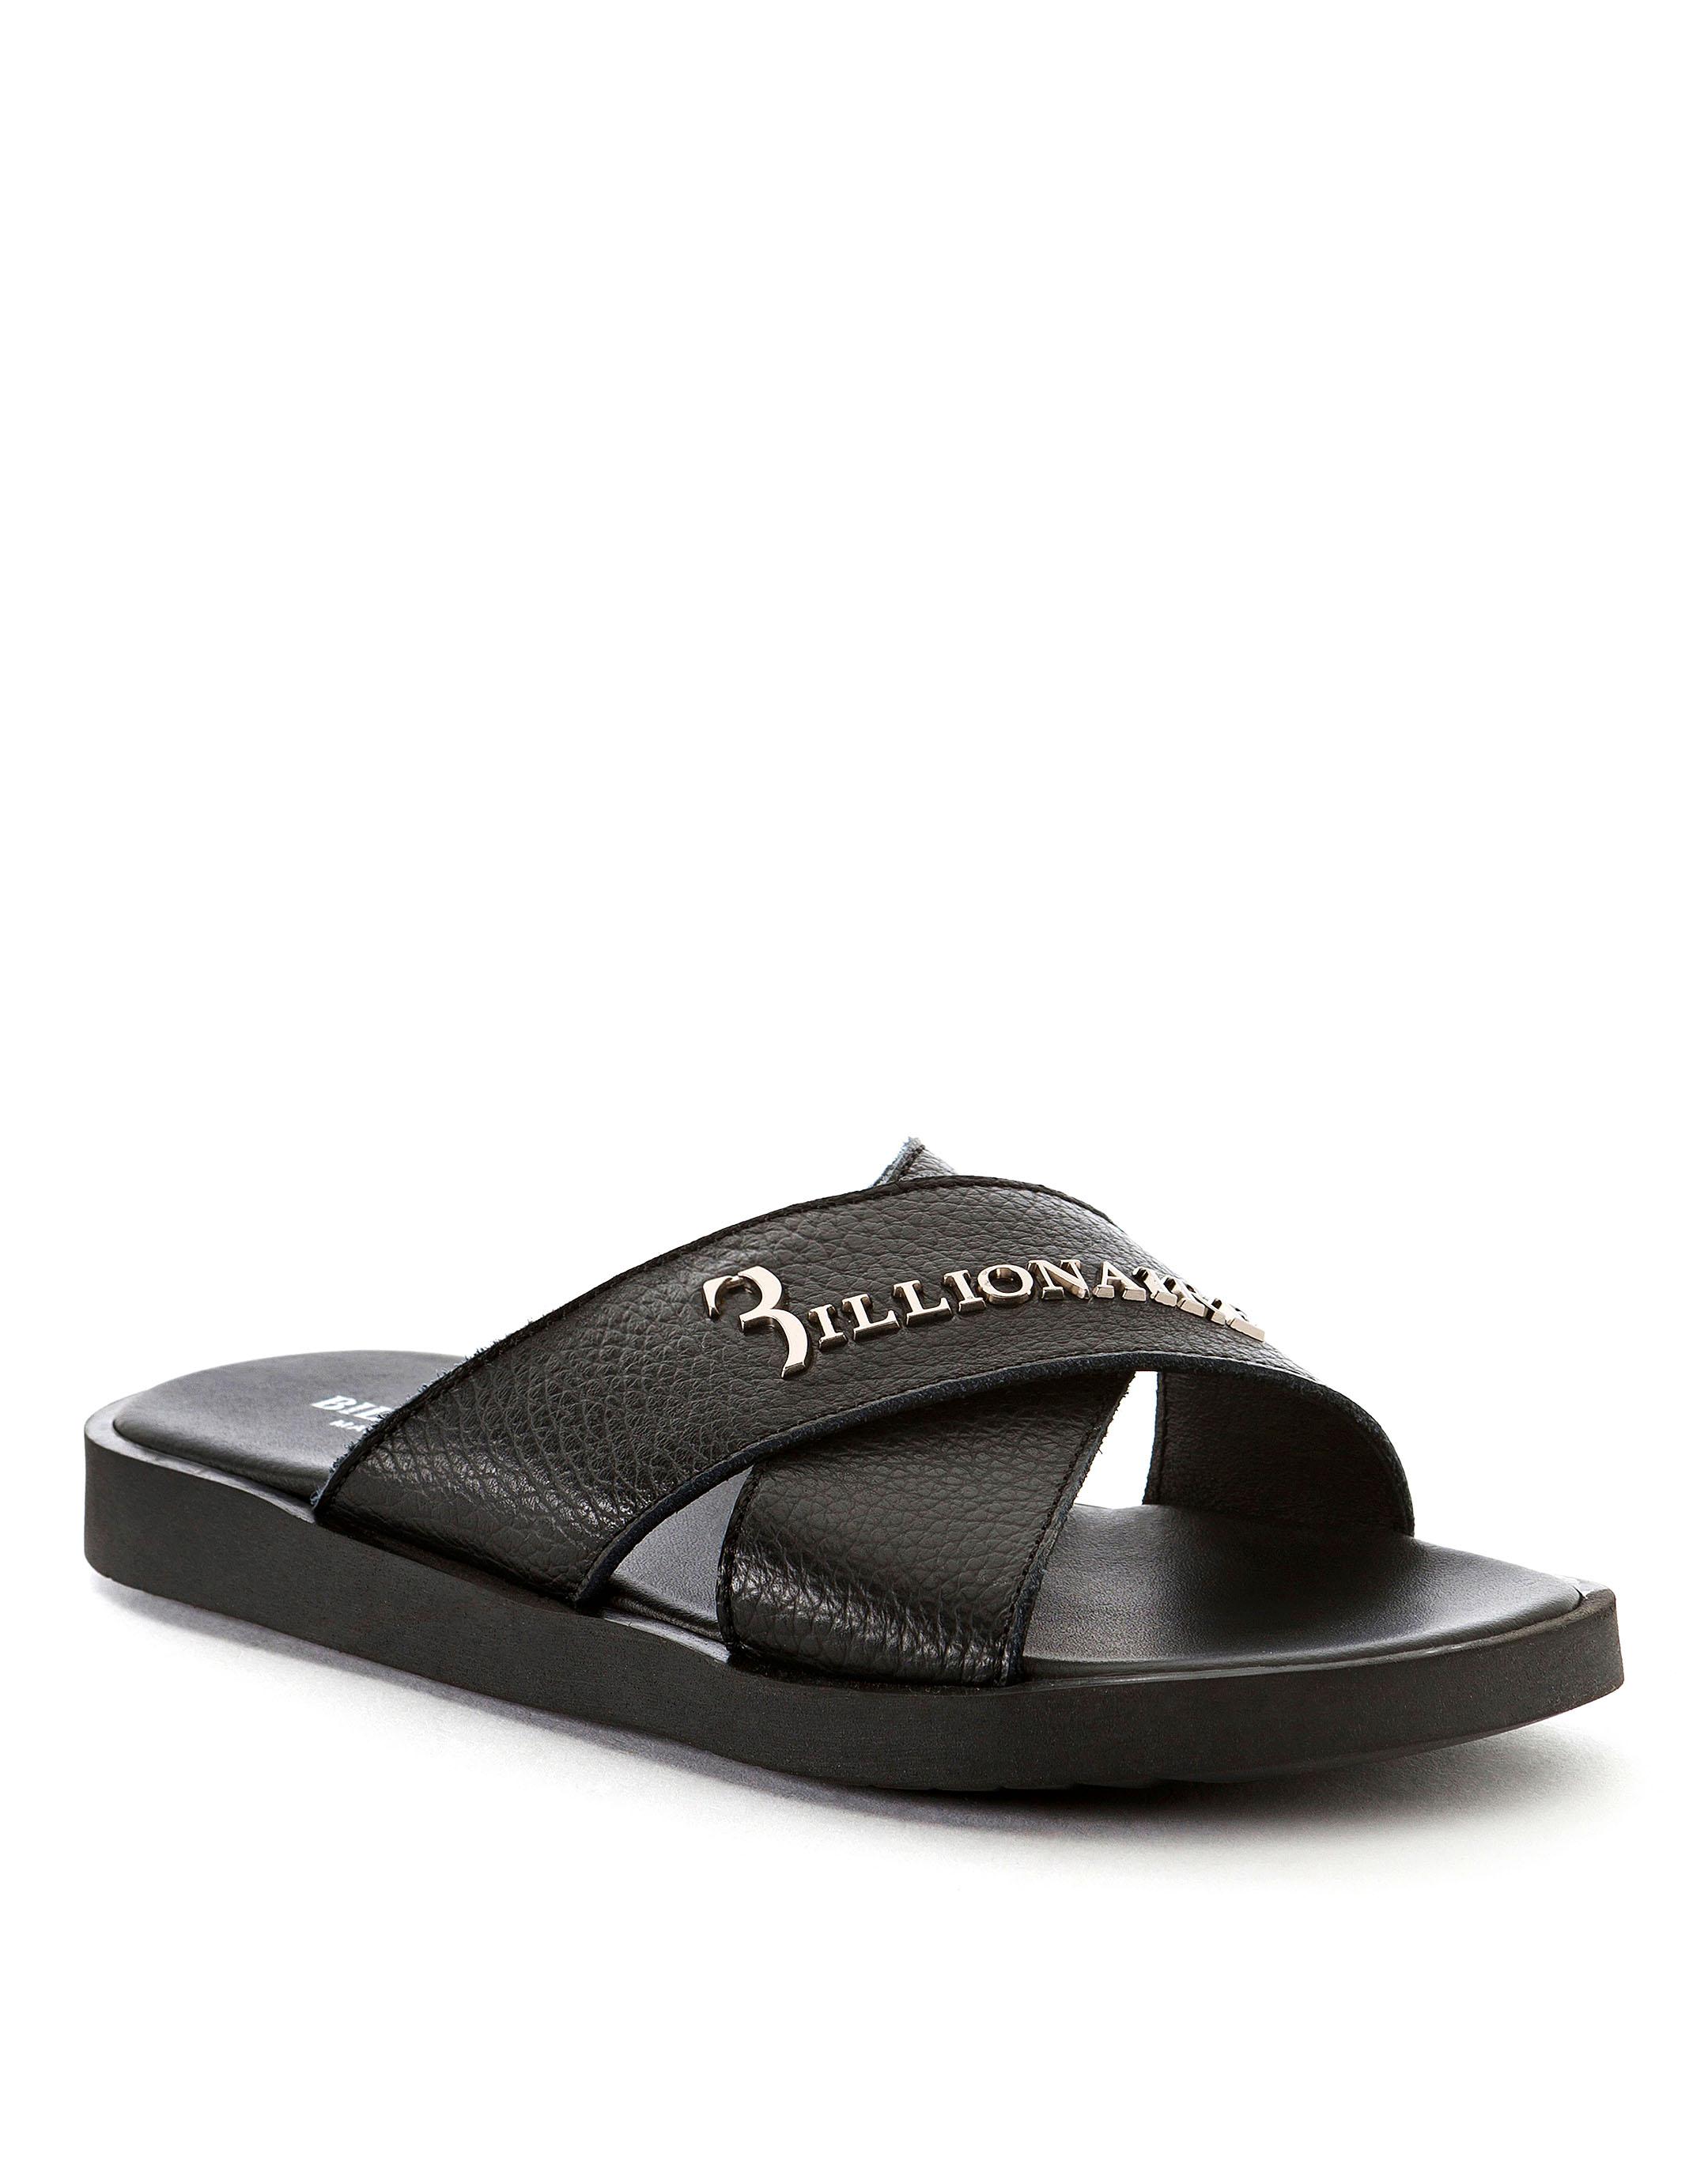 9255f5050a676c Sandals Flat Statement Billionaire